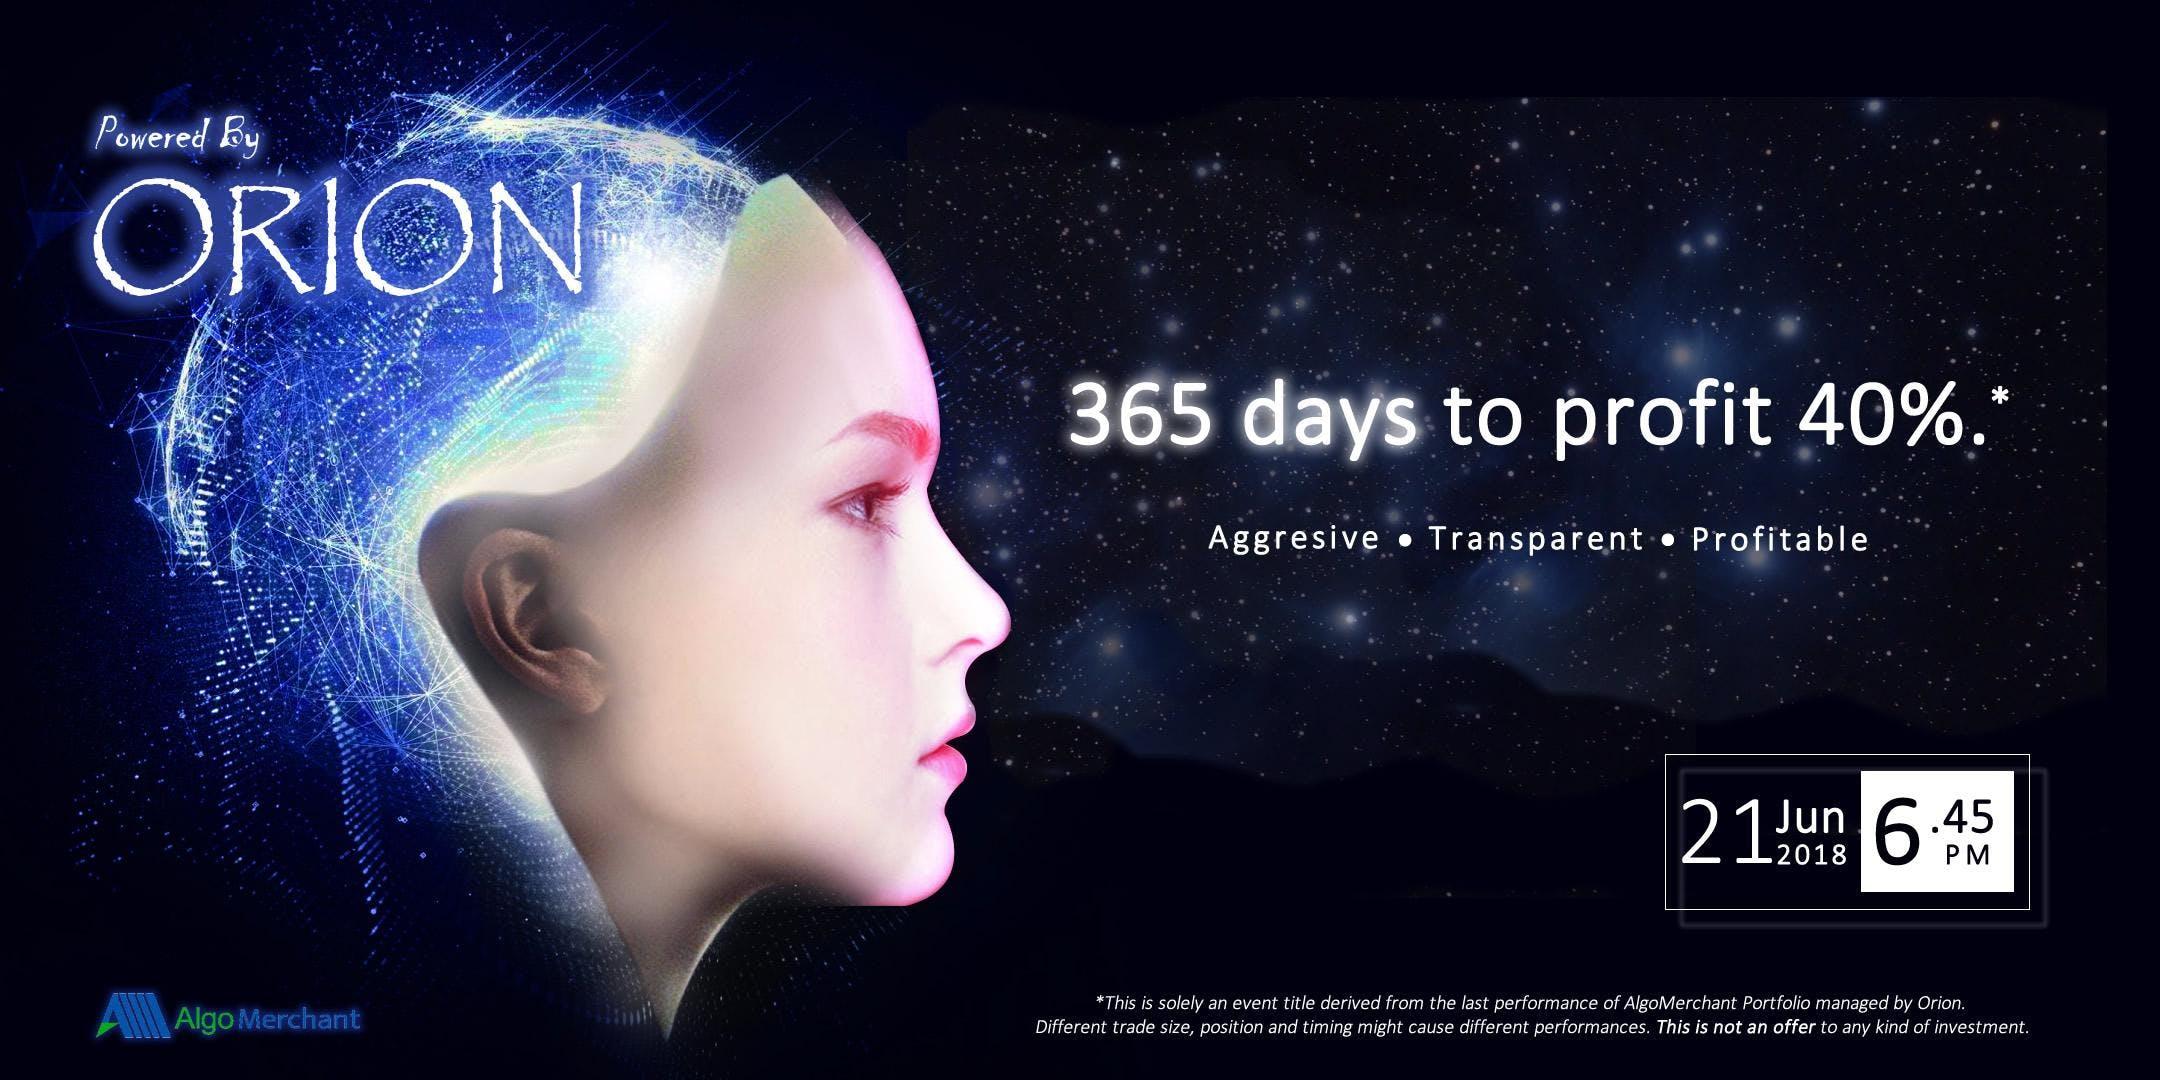 365 days to profit 40%